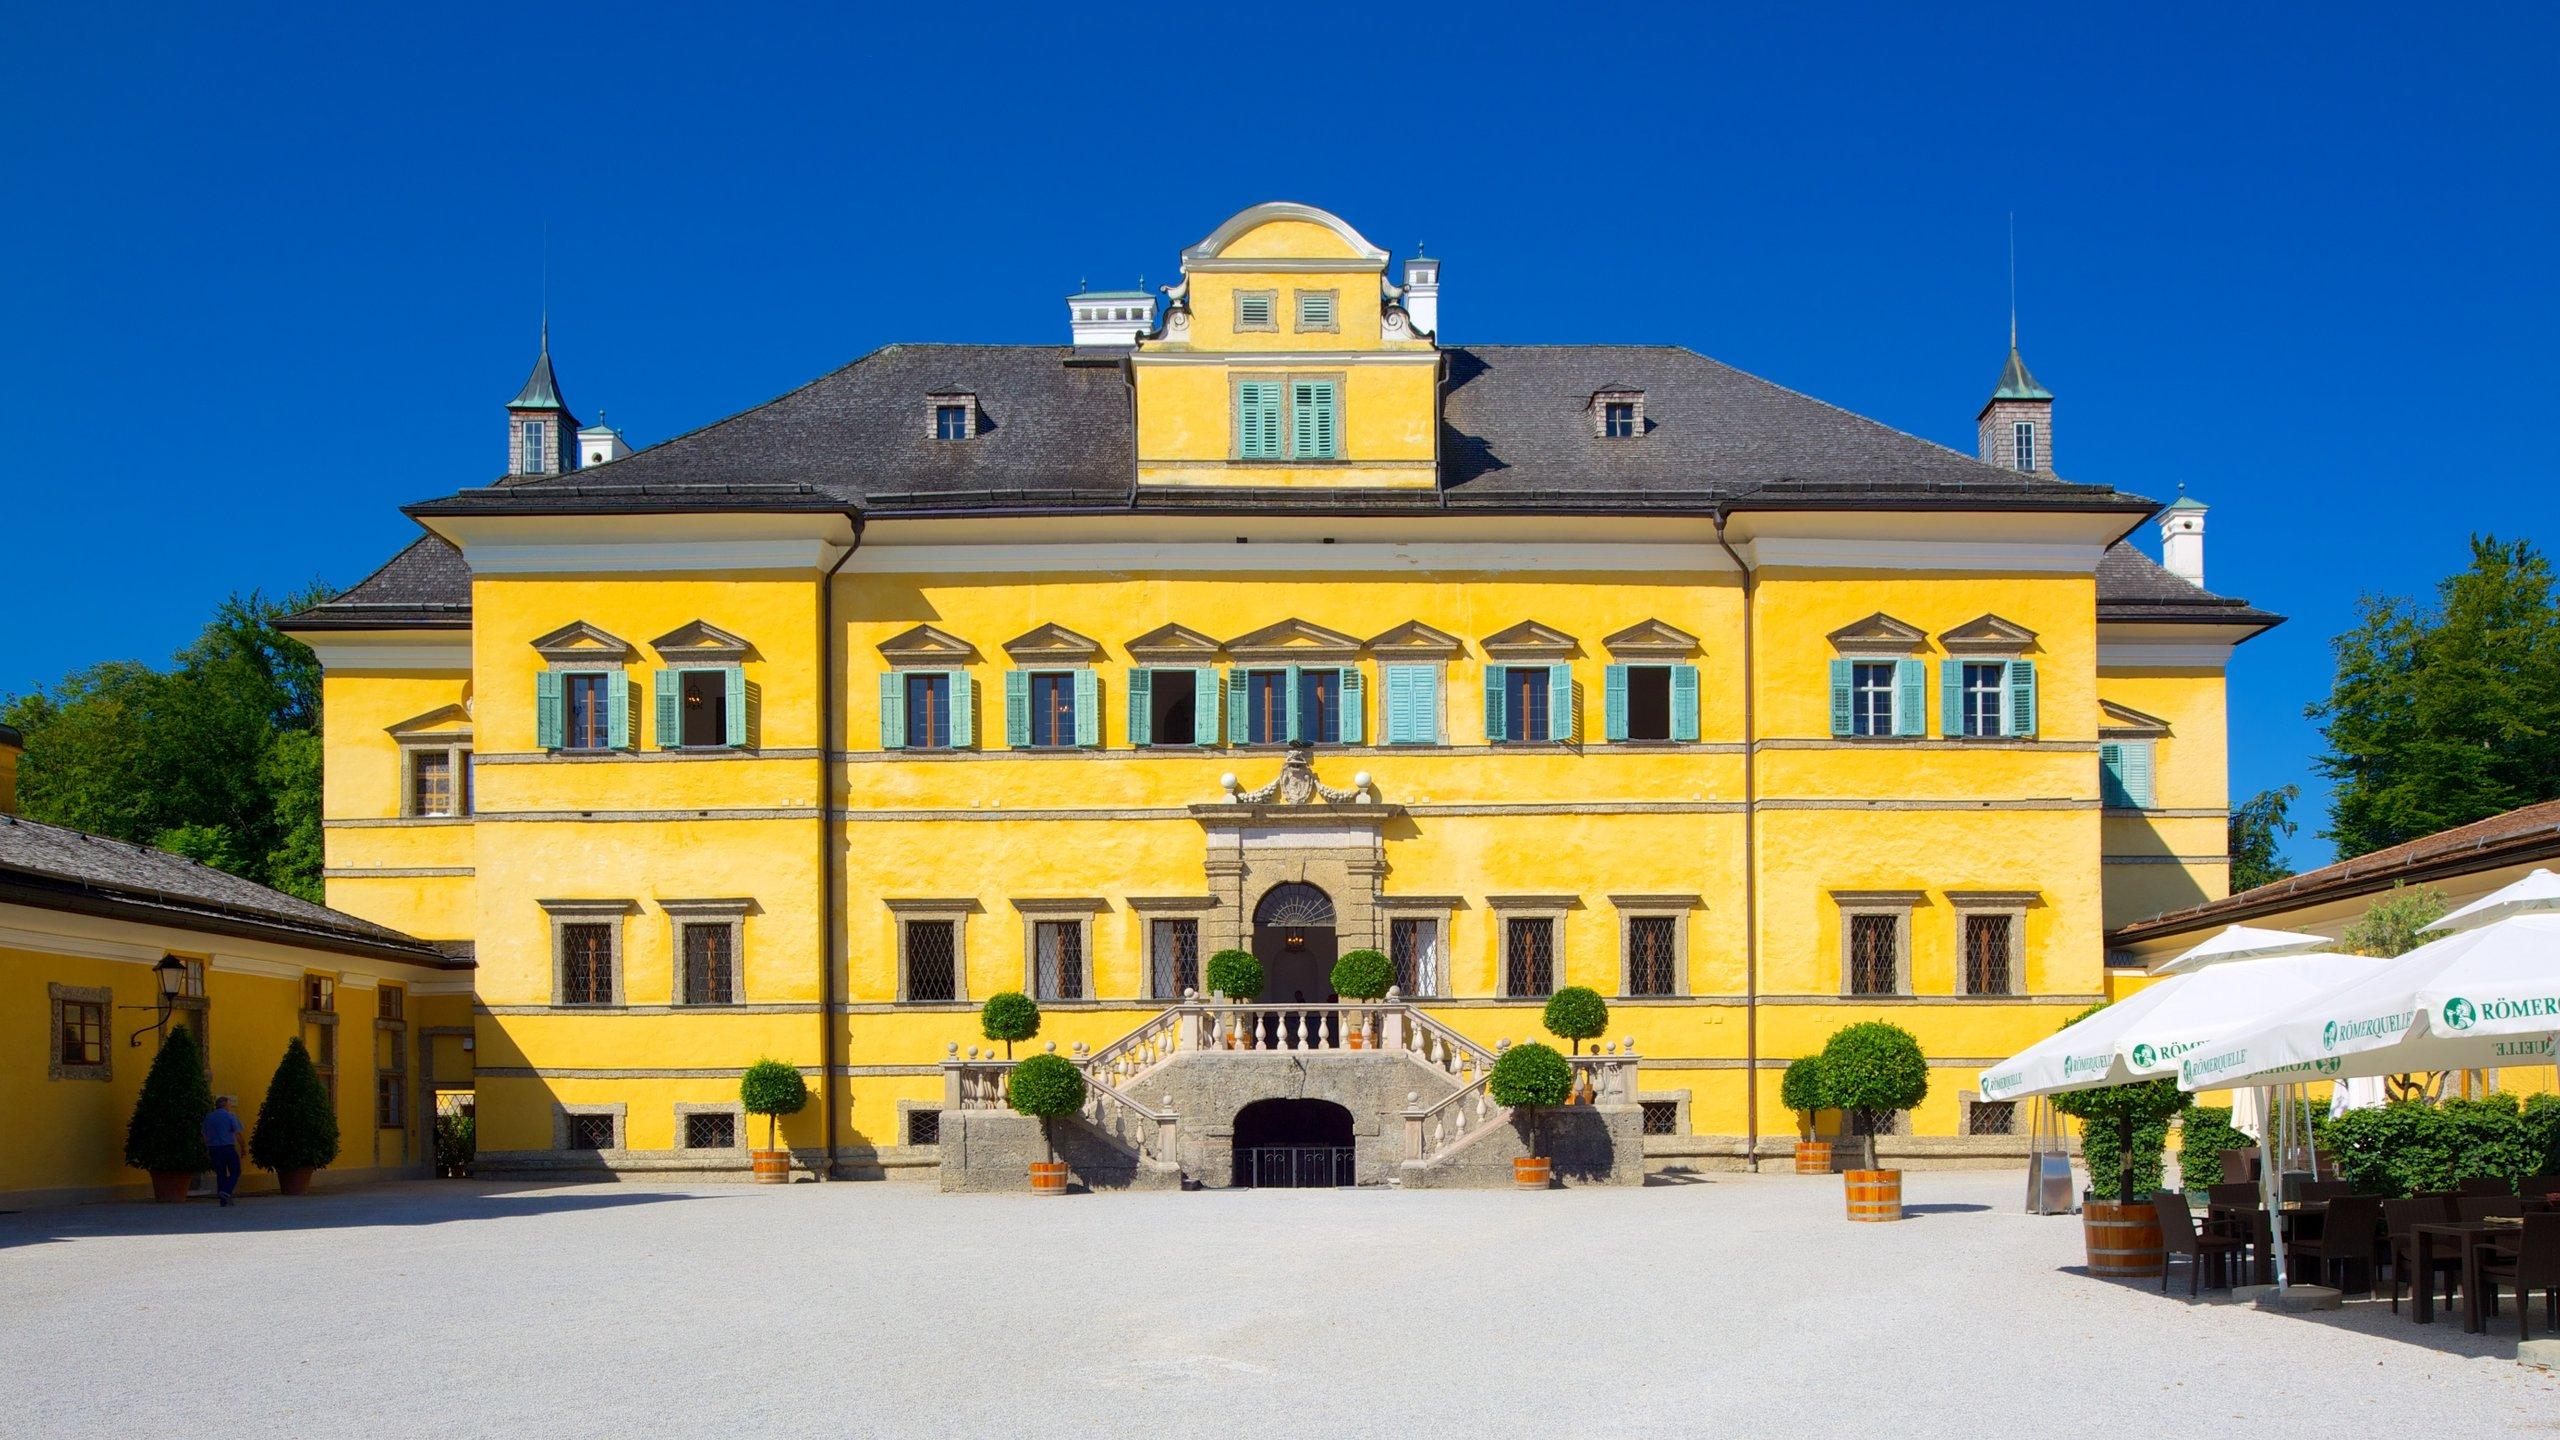 Salzburg-Umgebung District, Salzburg State, Austria